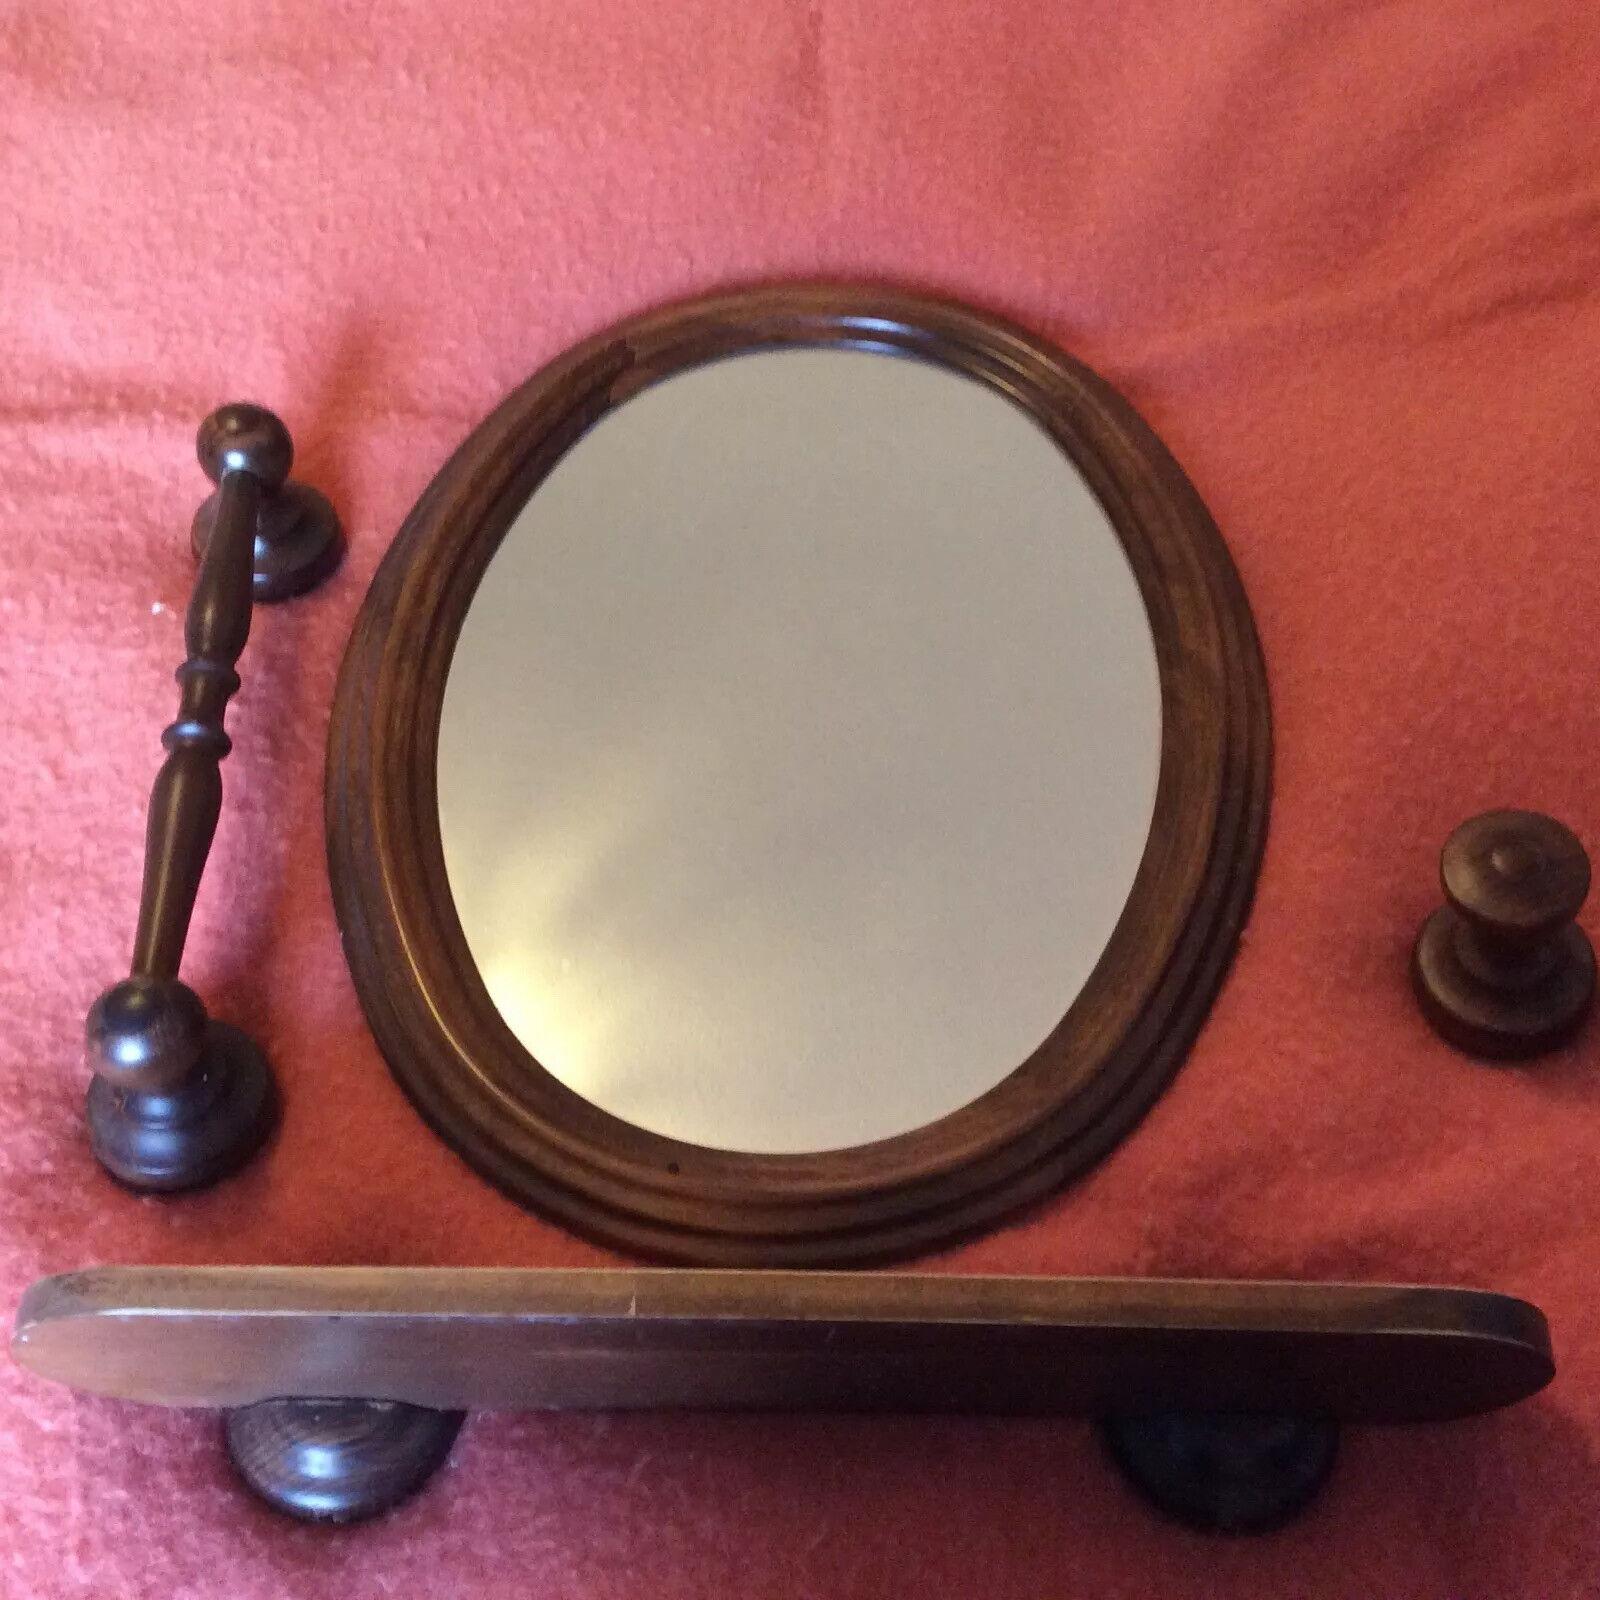 Vintage French Bathroom oval Mirror Towel bar shelf Set solid Wood accessories